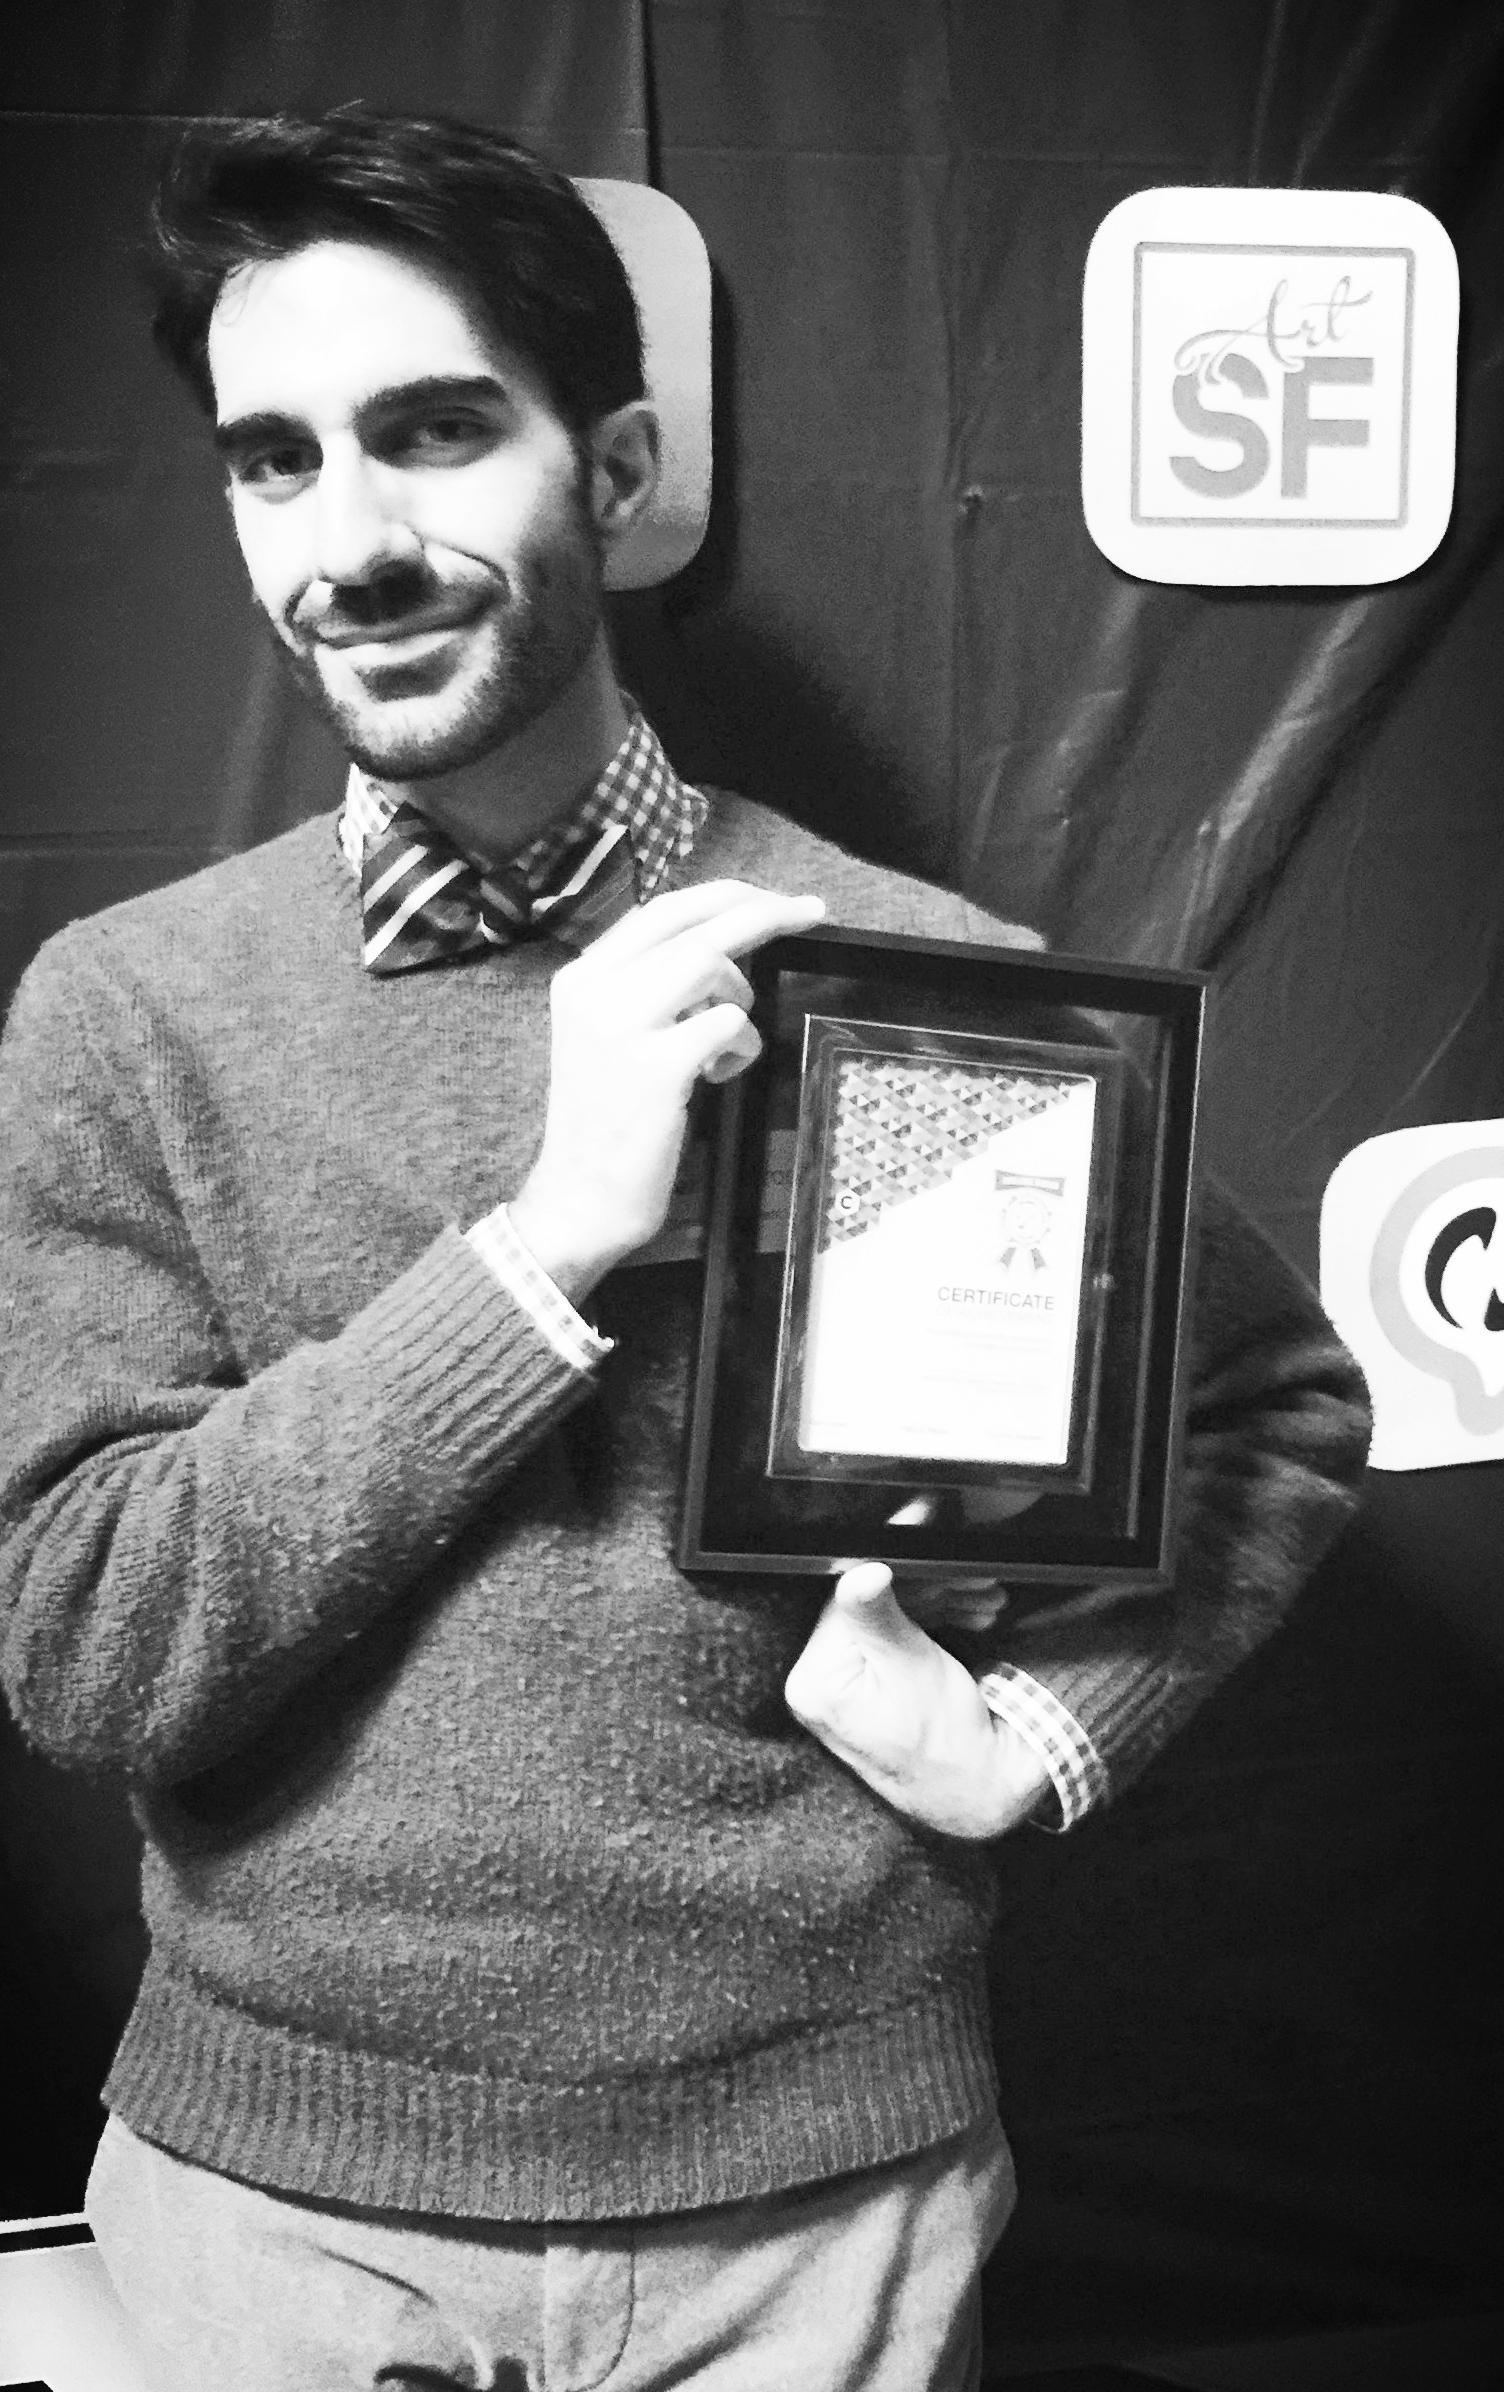 SF Art Opening wins the best UX award